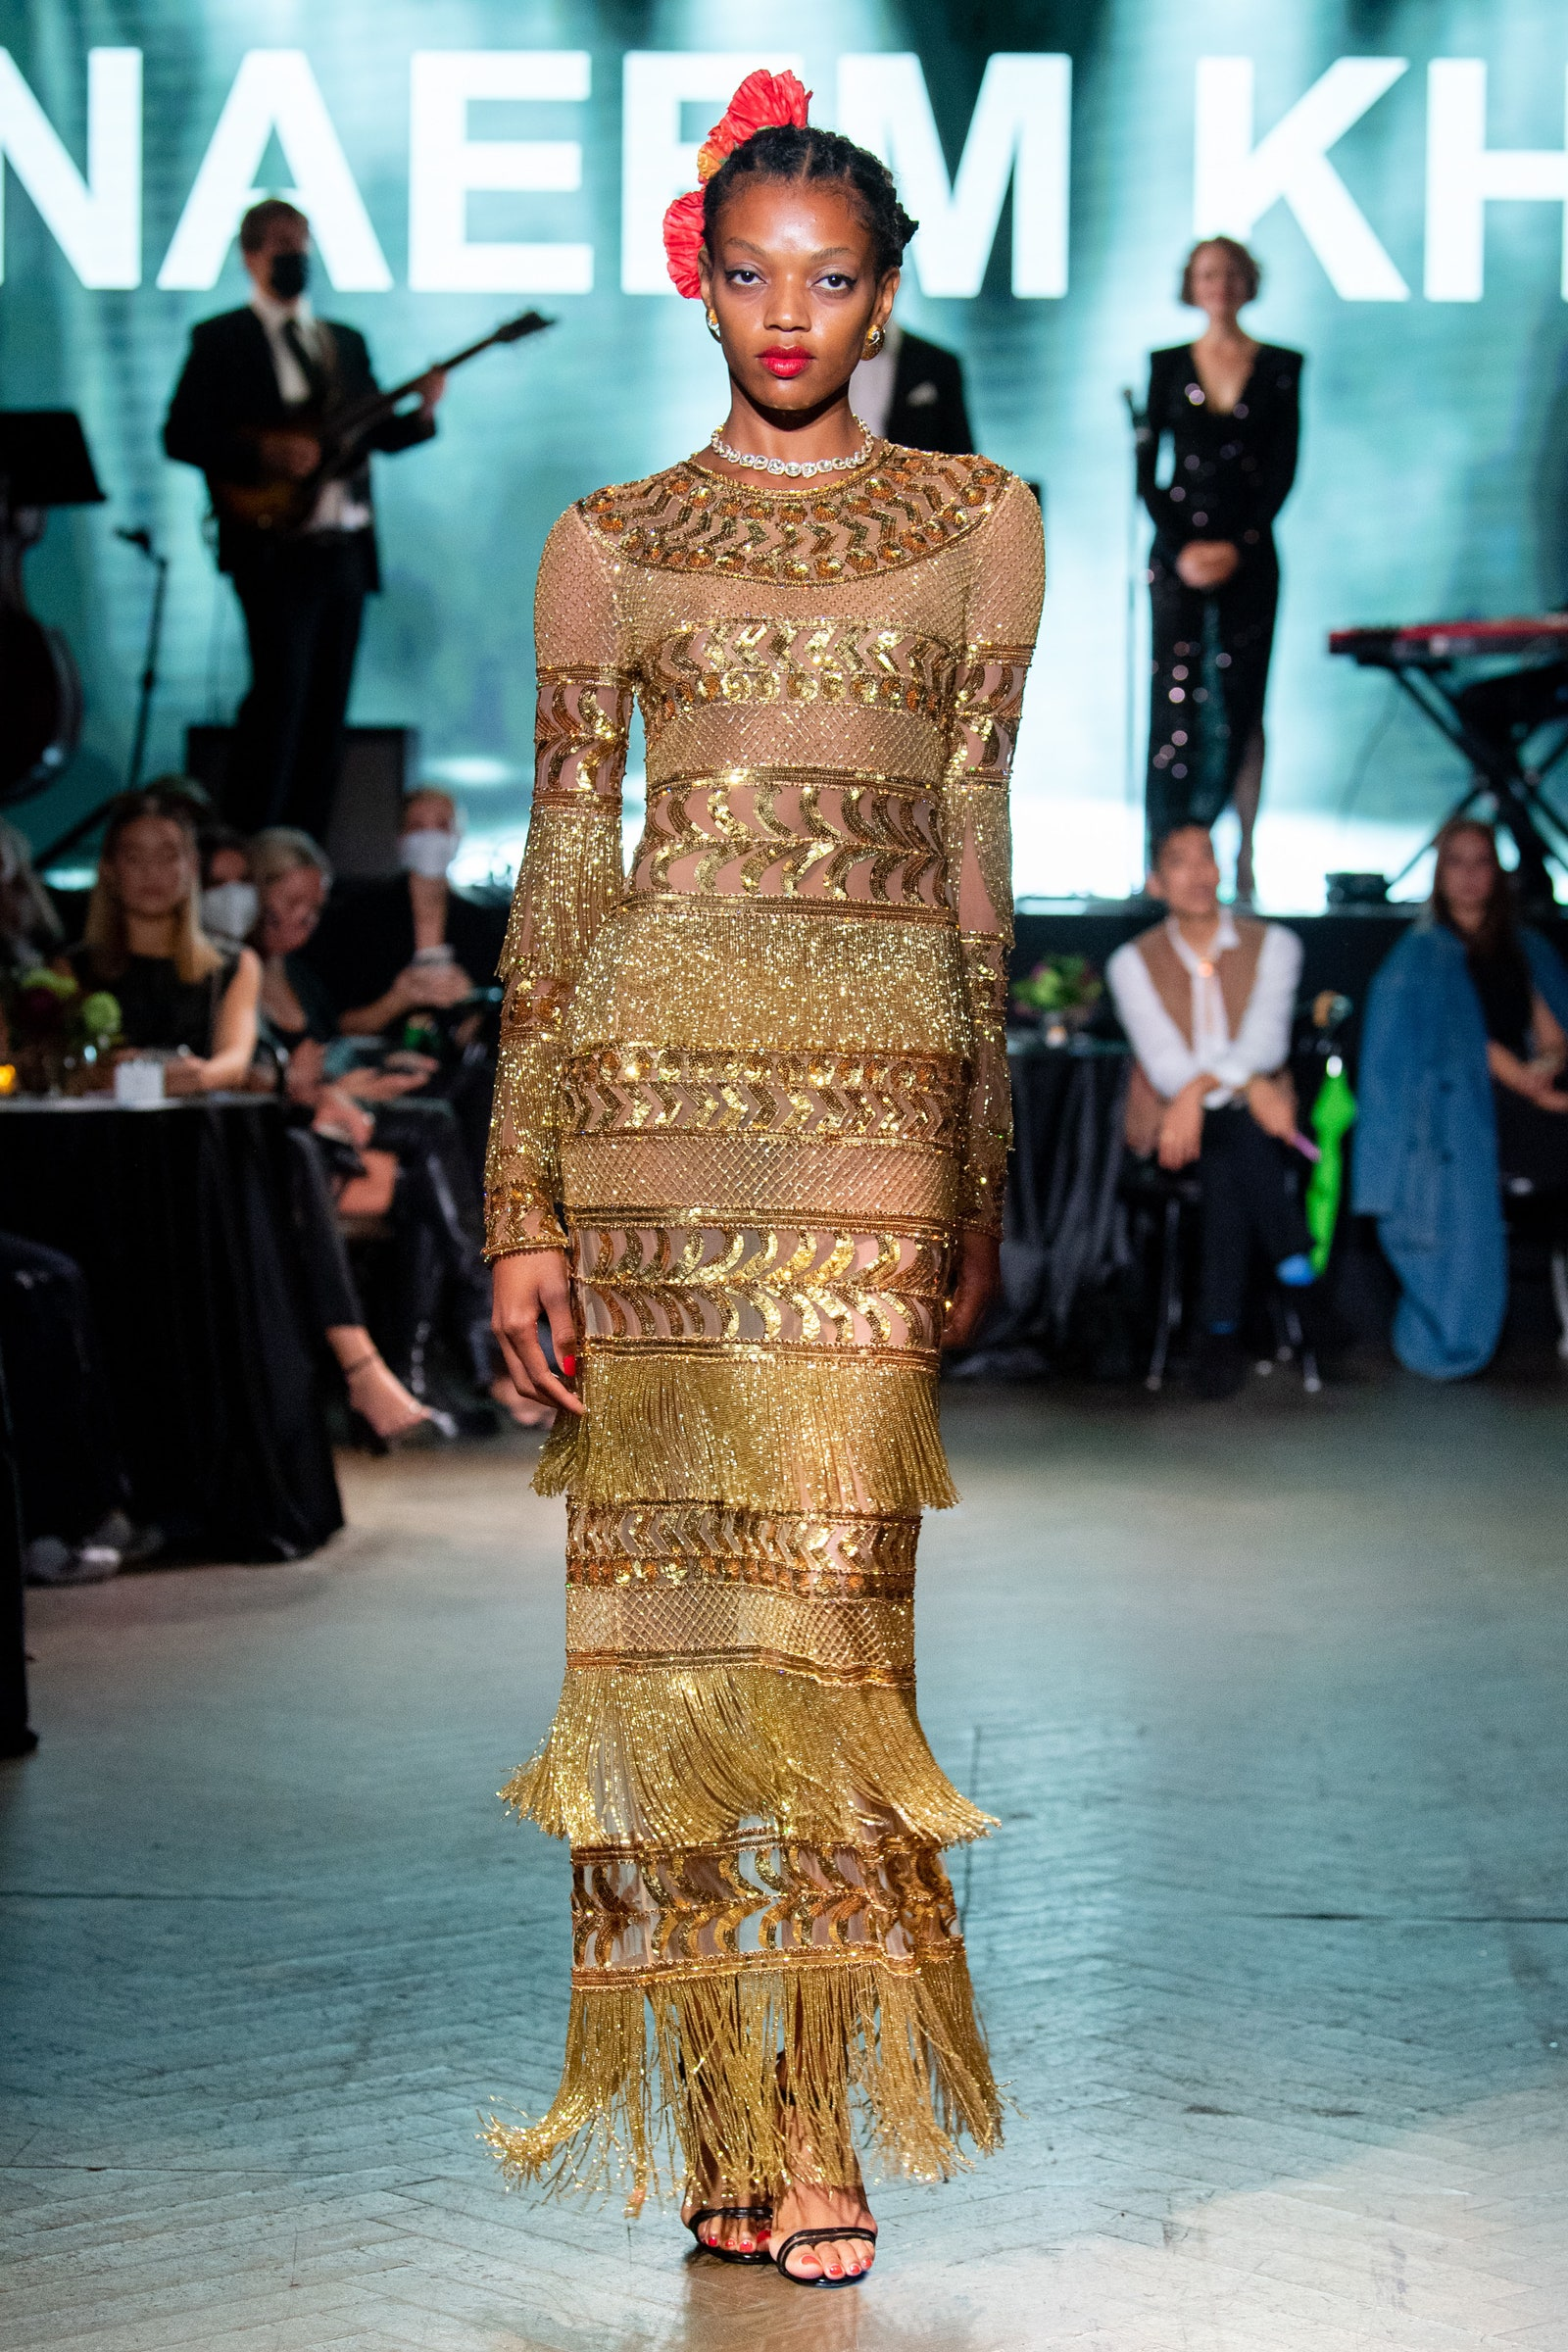 new-york-fashion-week-nyfw-ss22-spring-summer-2022